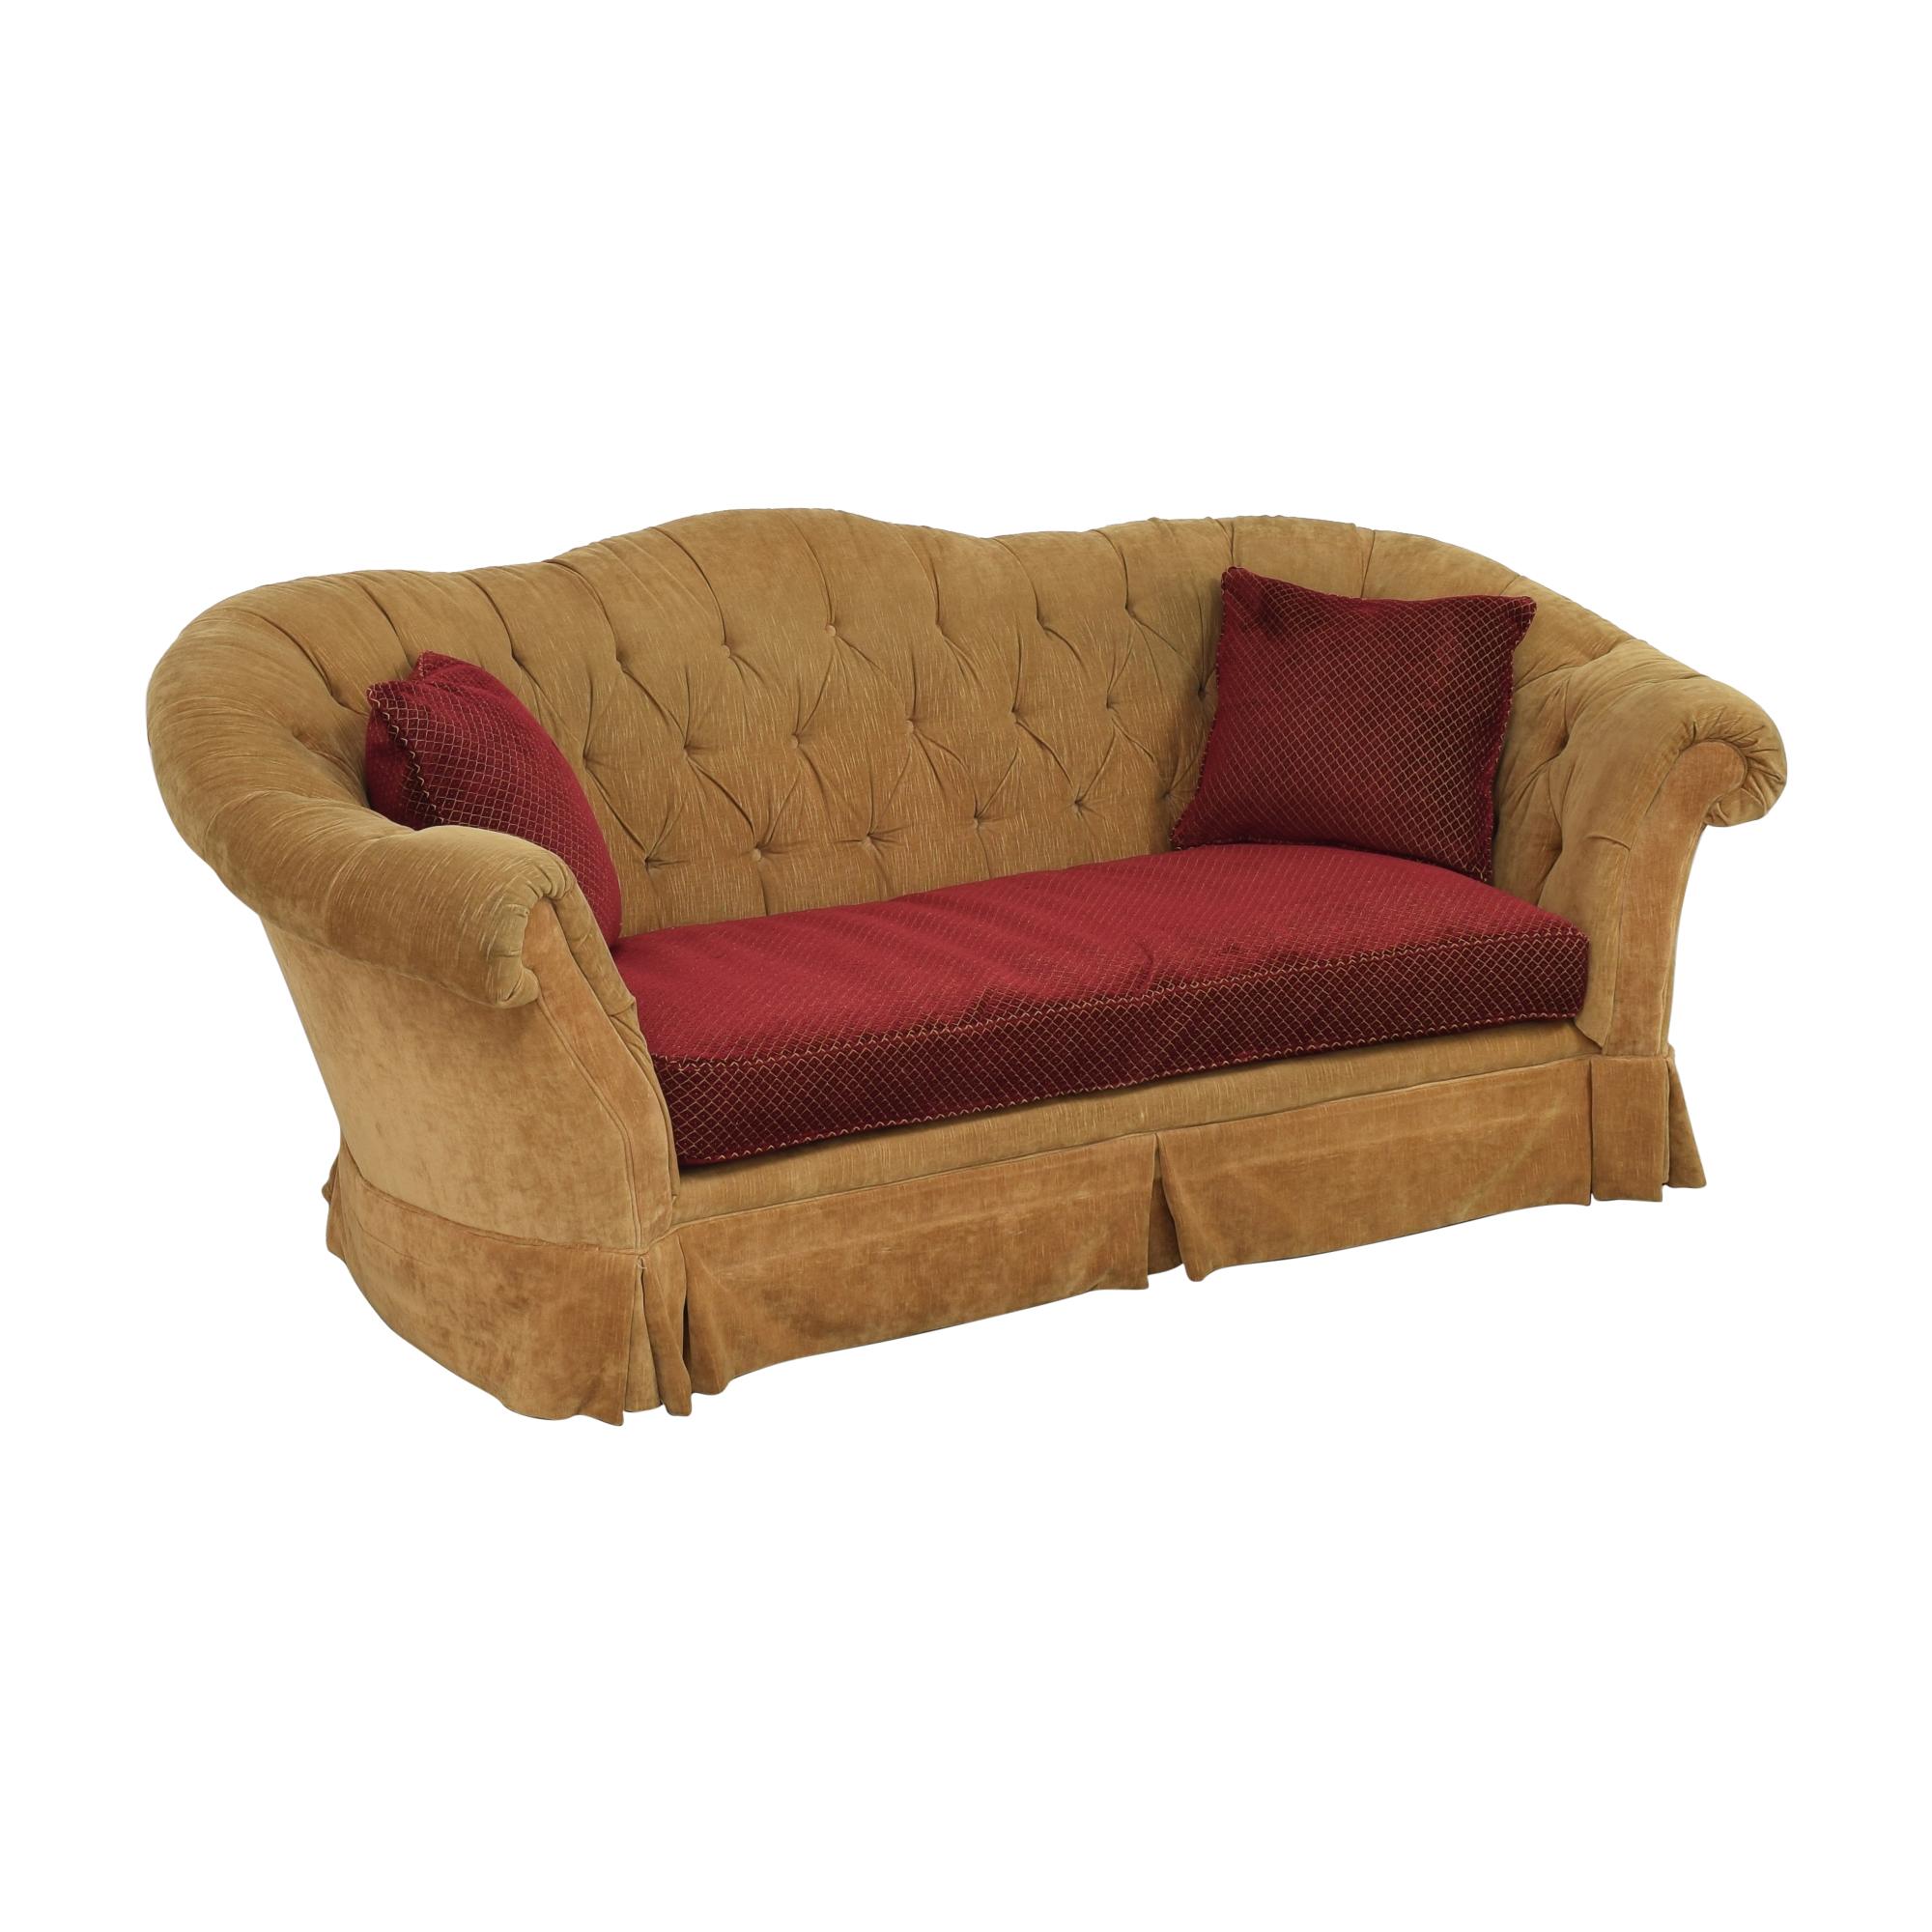 Domain Home Domain Home Two Tone Curve Tufted Sofa used